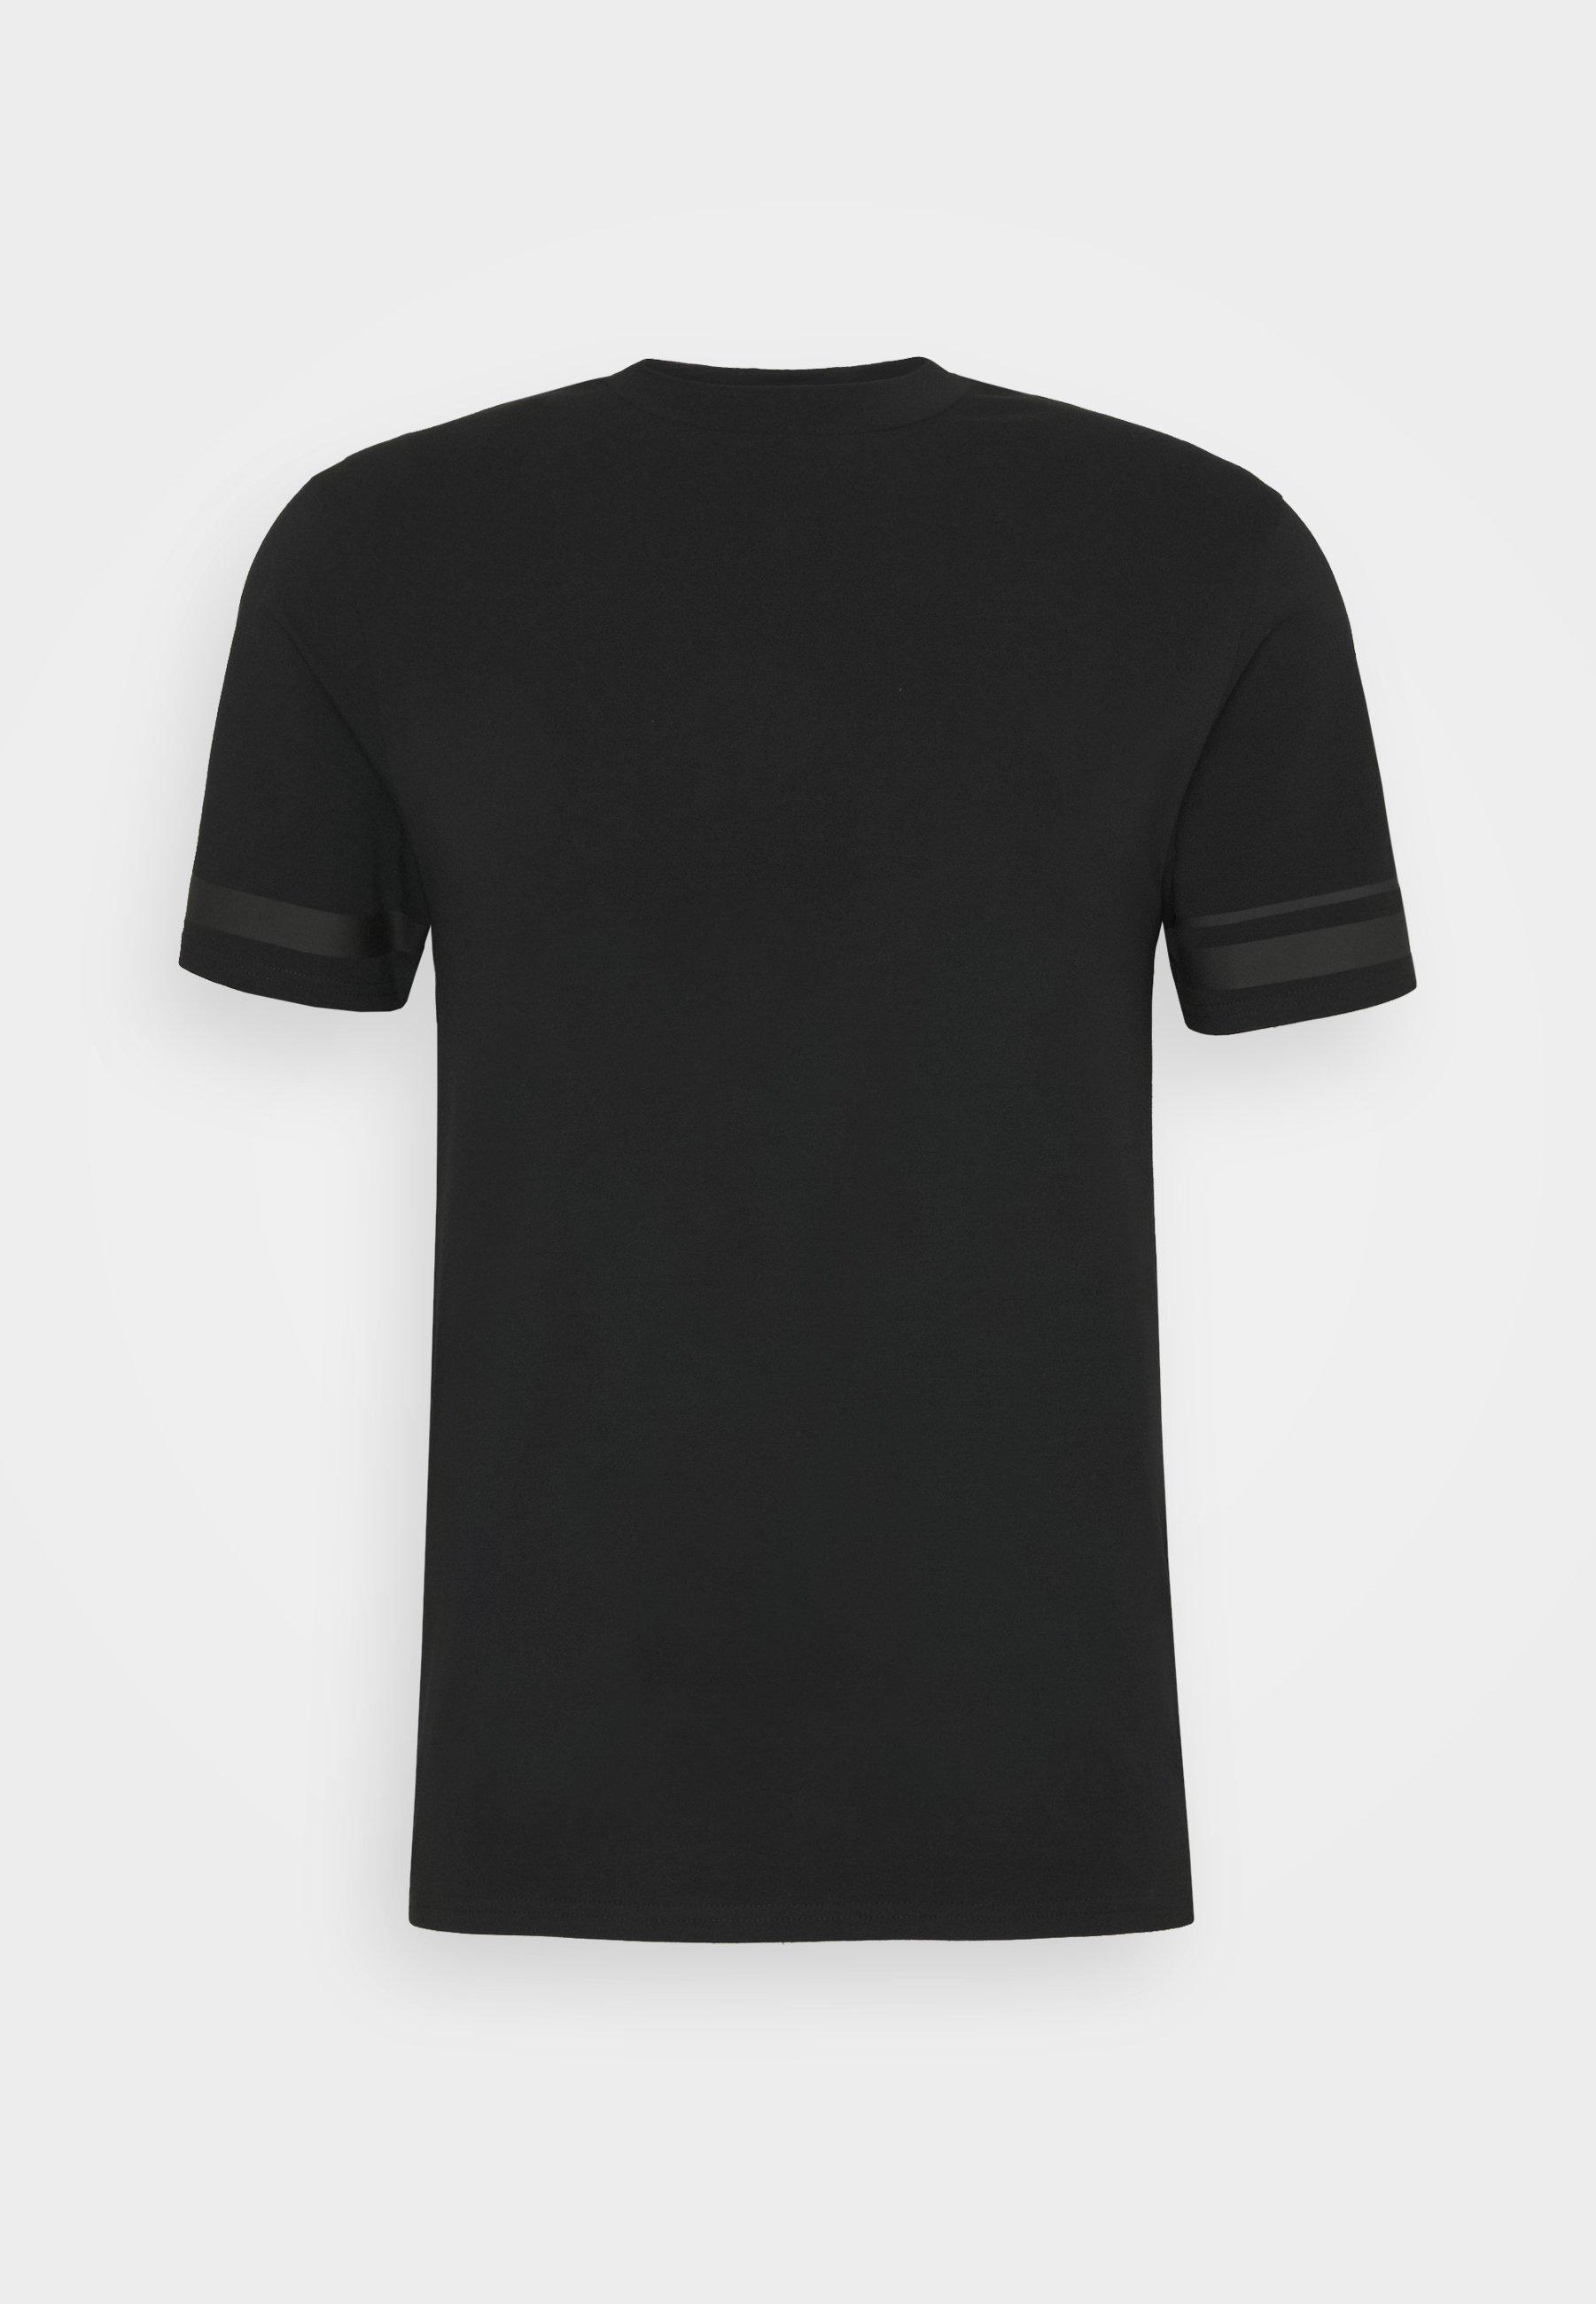 Homme BONDED TAPE DETAIL SLIM FIT - T-shirt basique